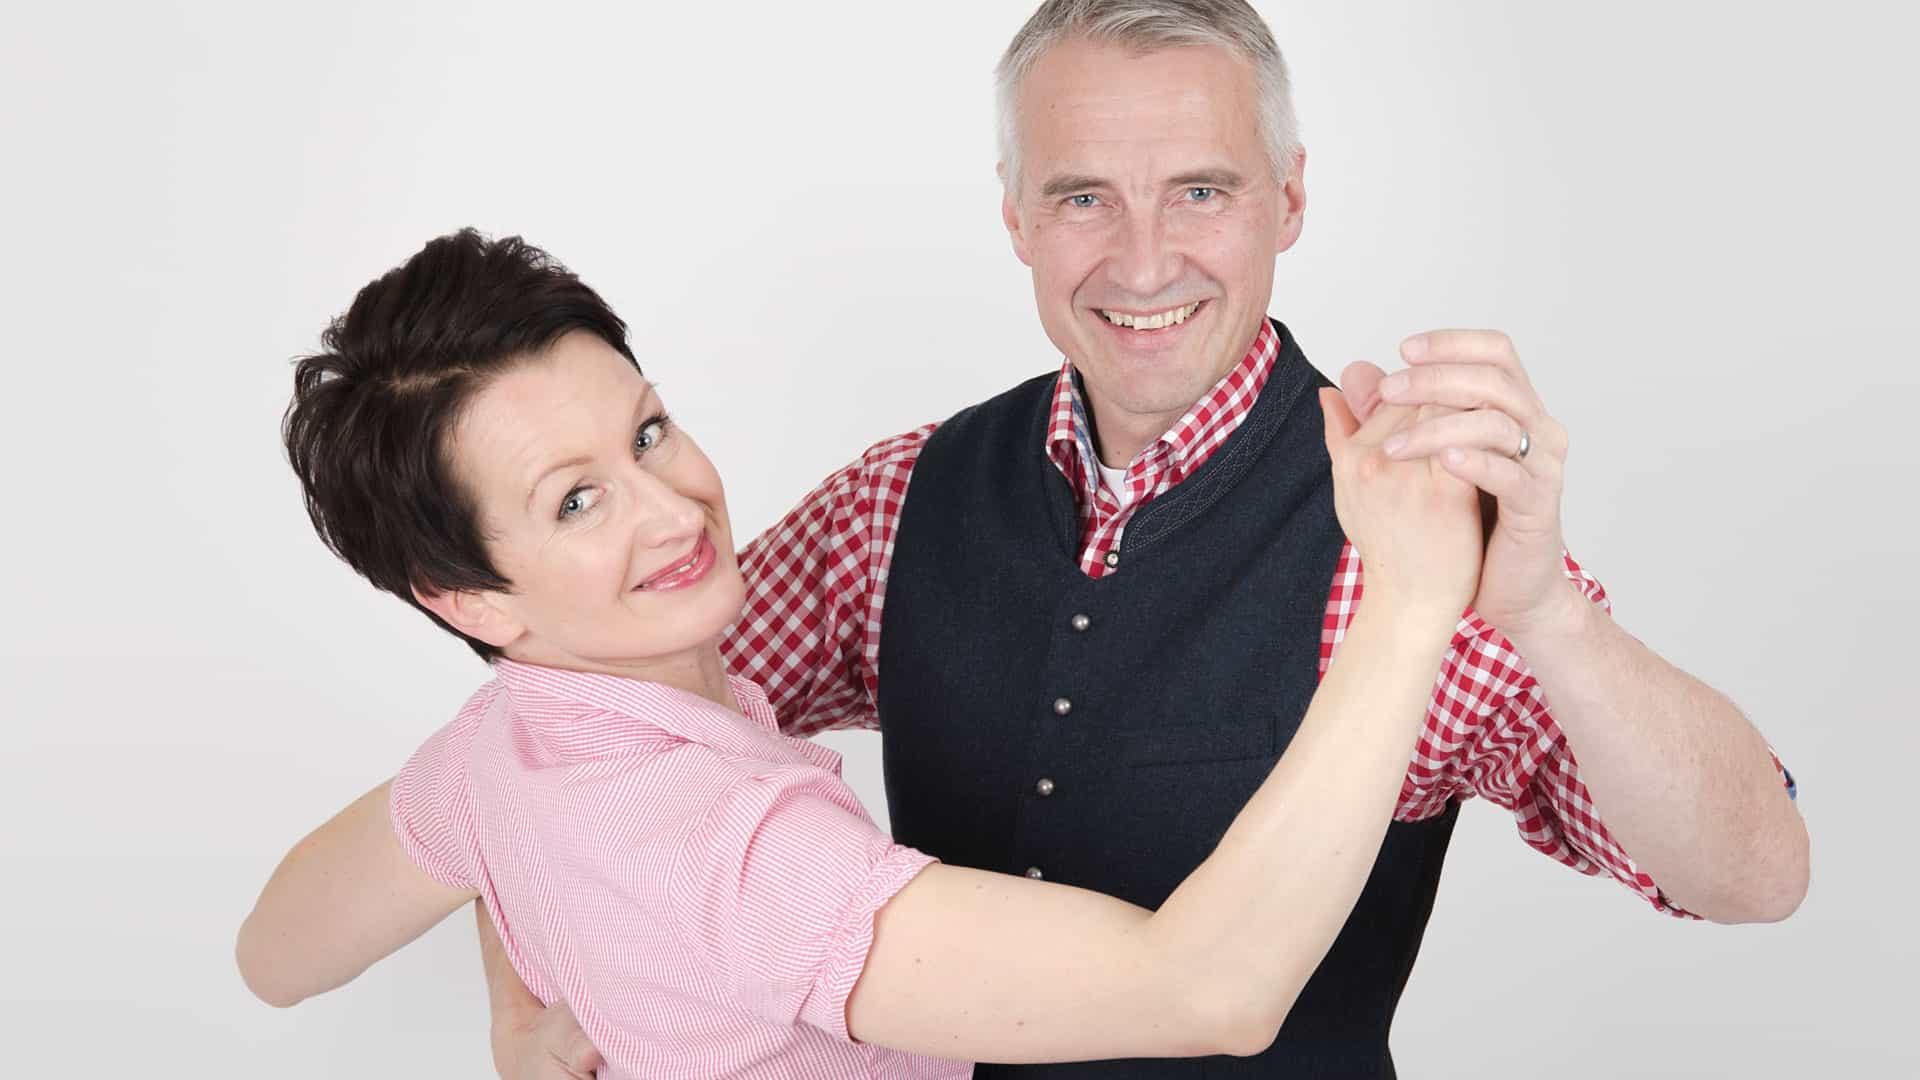 Hauska dating Blogit UK